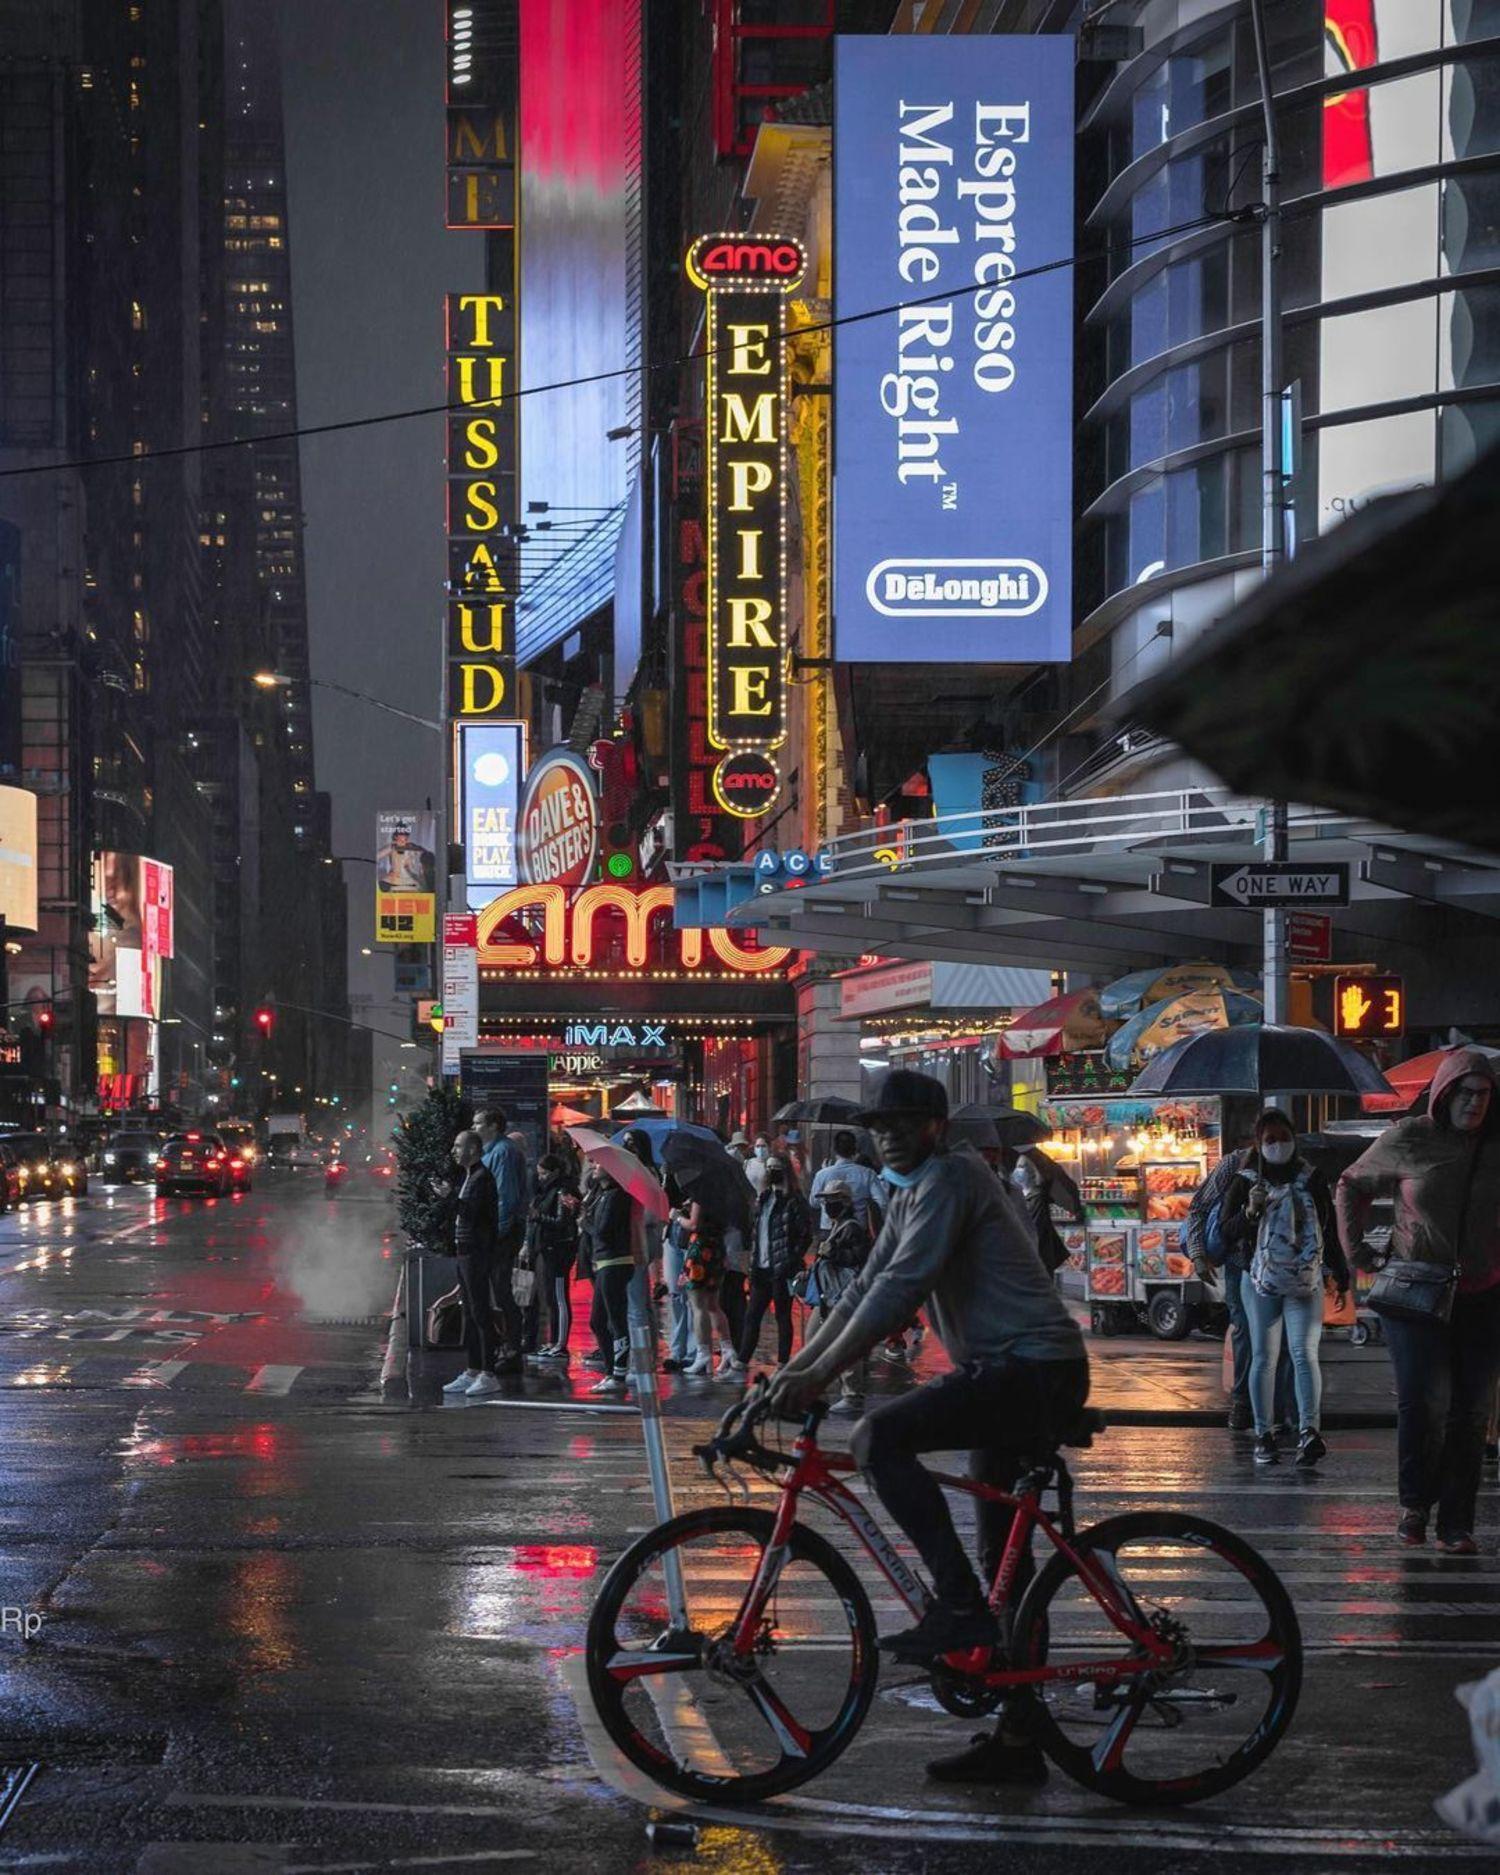 42nd Street, Midtown, Manhattan